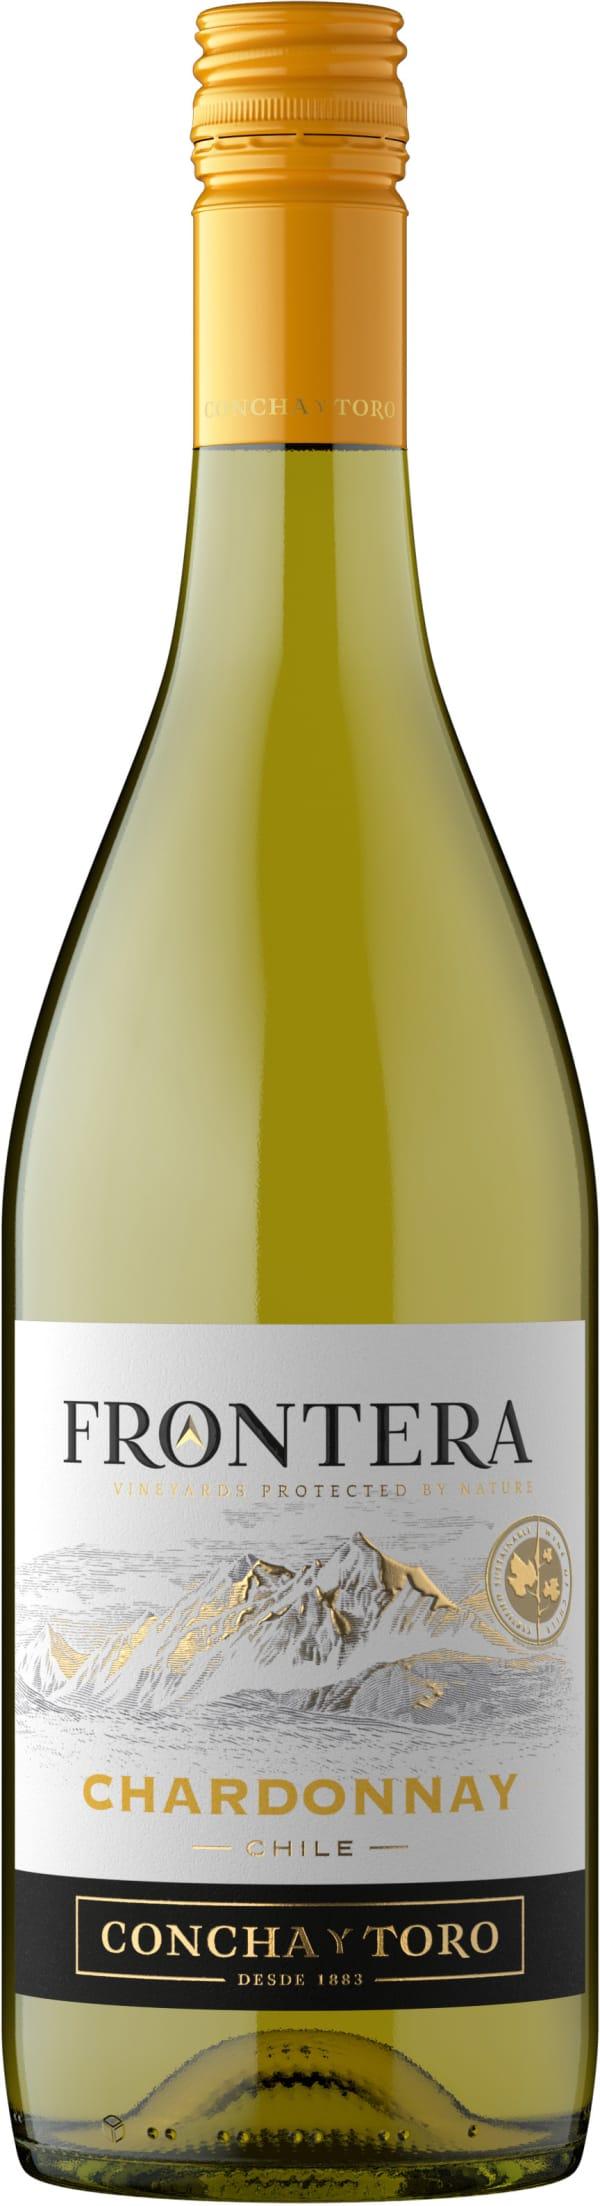 Frontera Chardonnay 2016